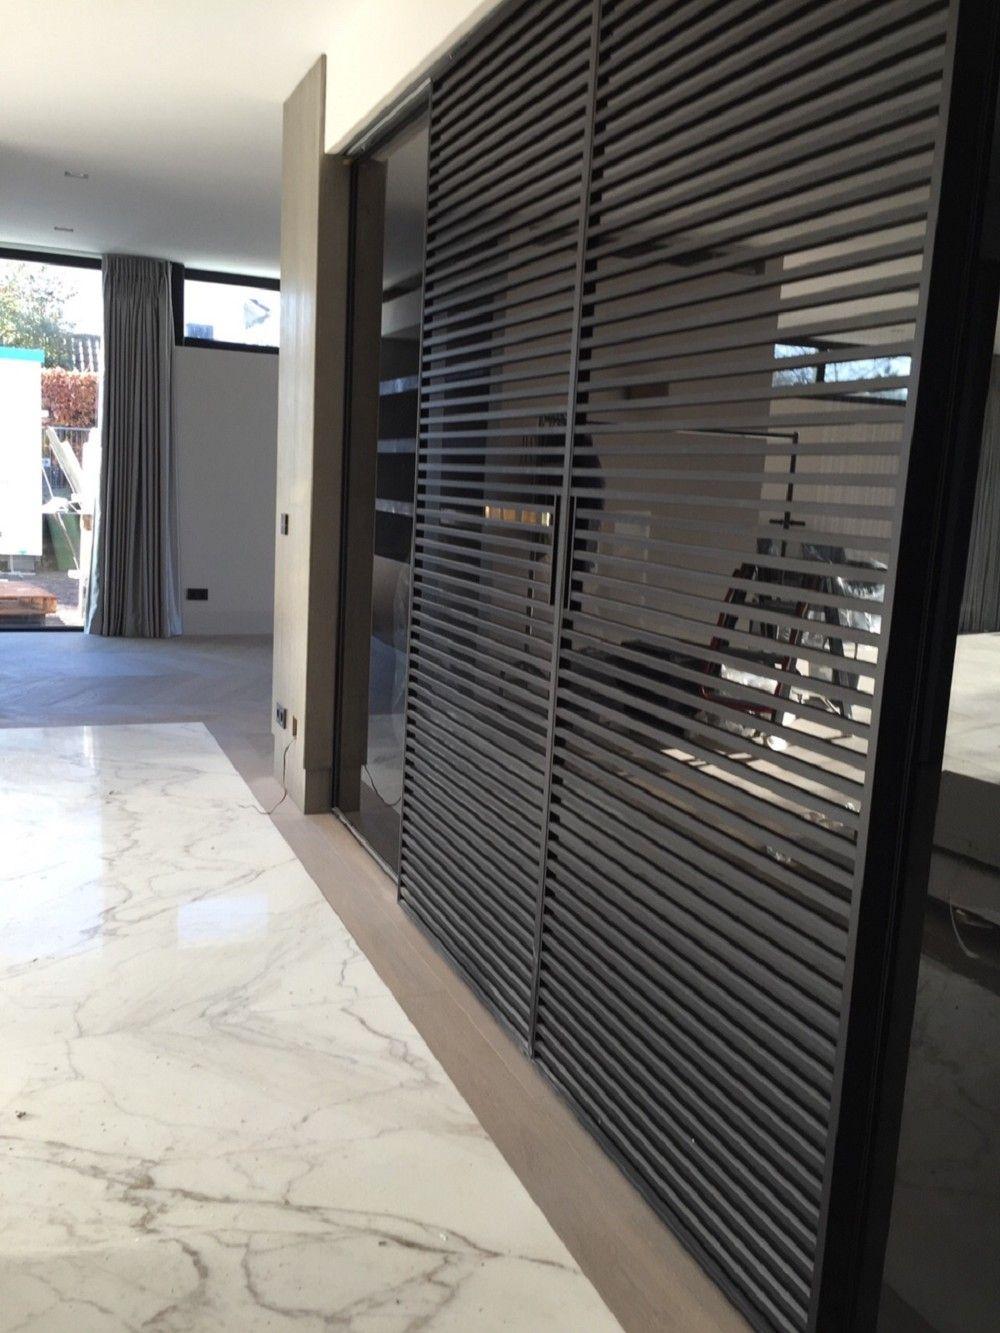 noctum projecten rimadesio projectinrichter projectreferentie rimadesio stripe. Black Bedroom Furniture Sets. Home Design Ideas